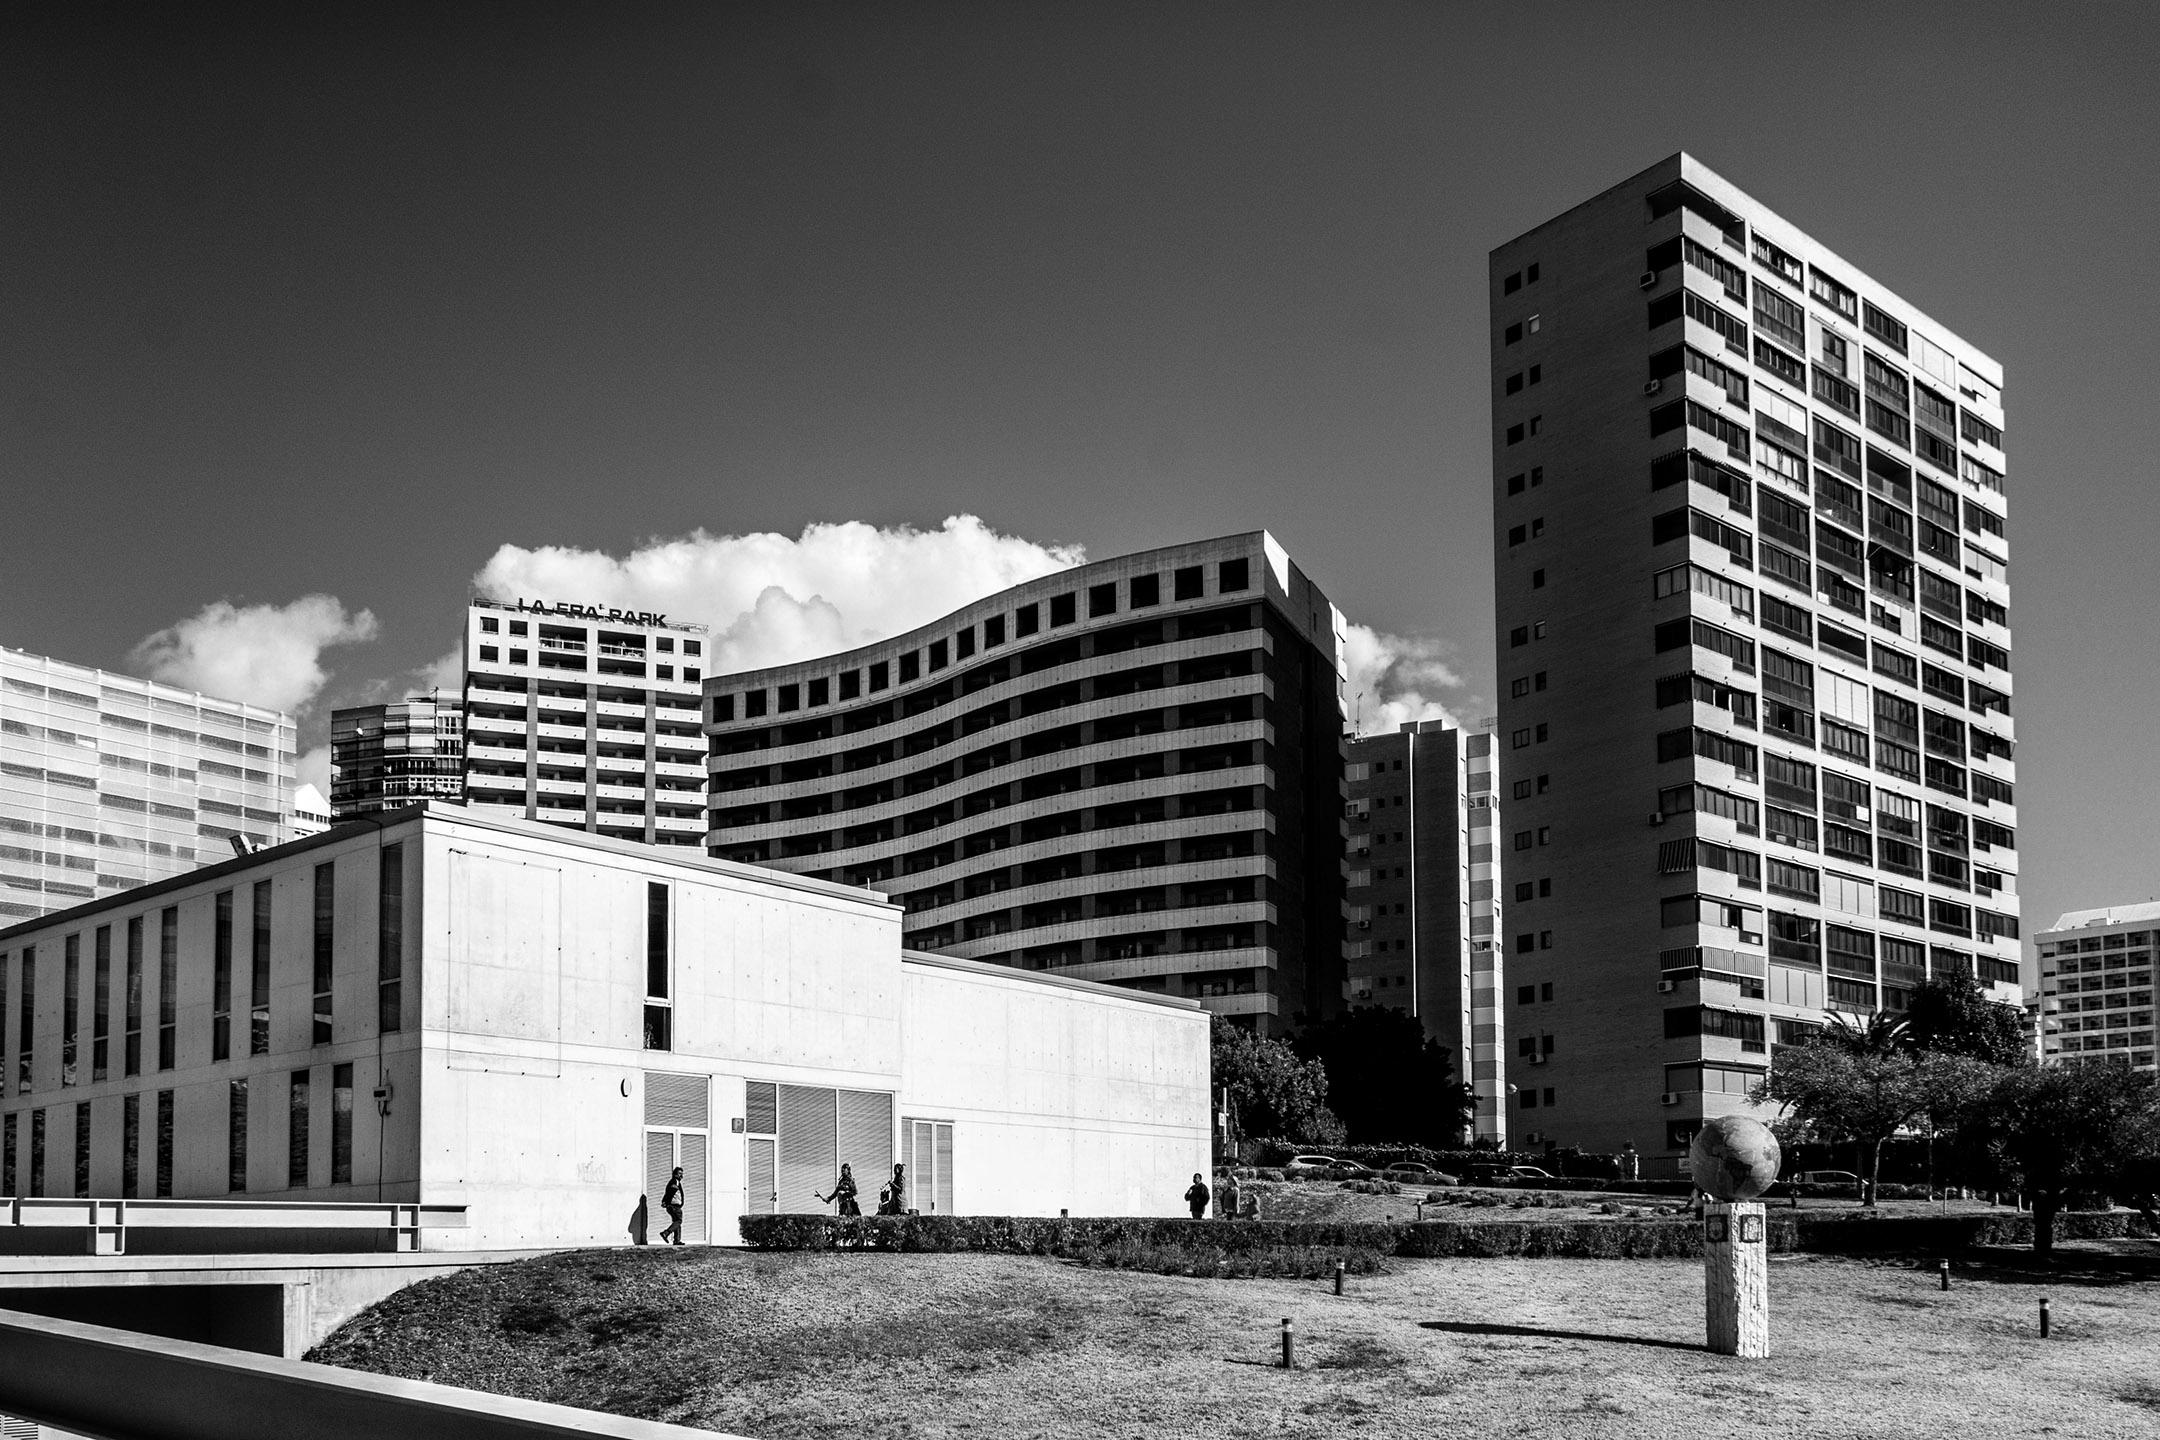 Architecture of Benidorm